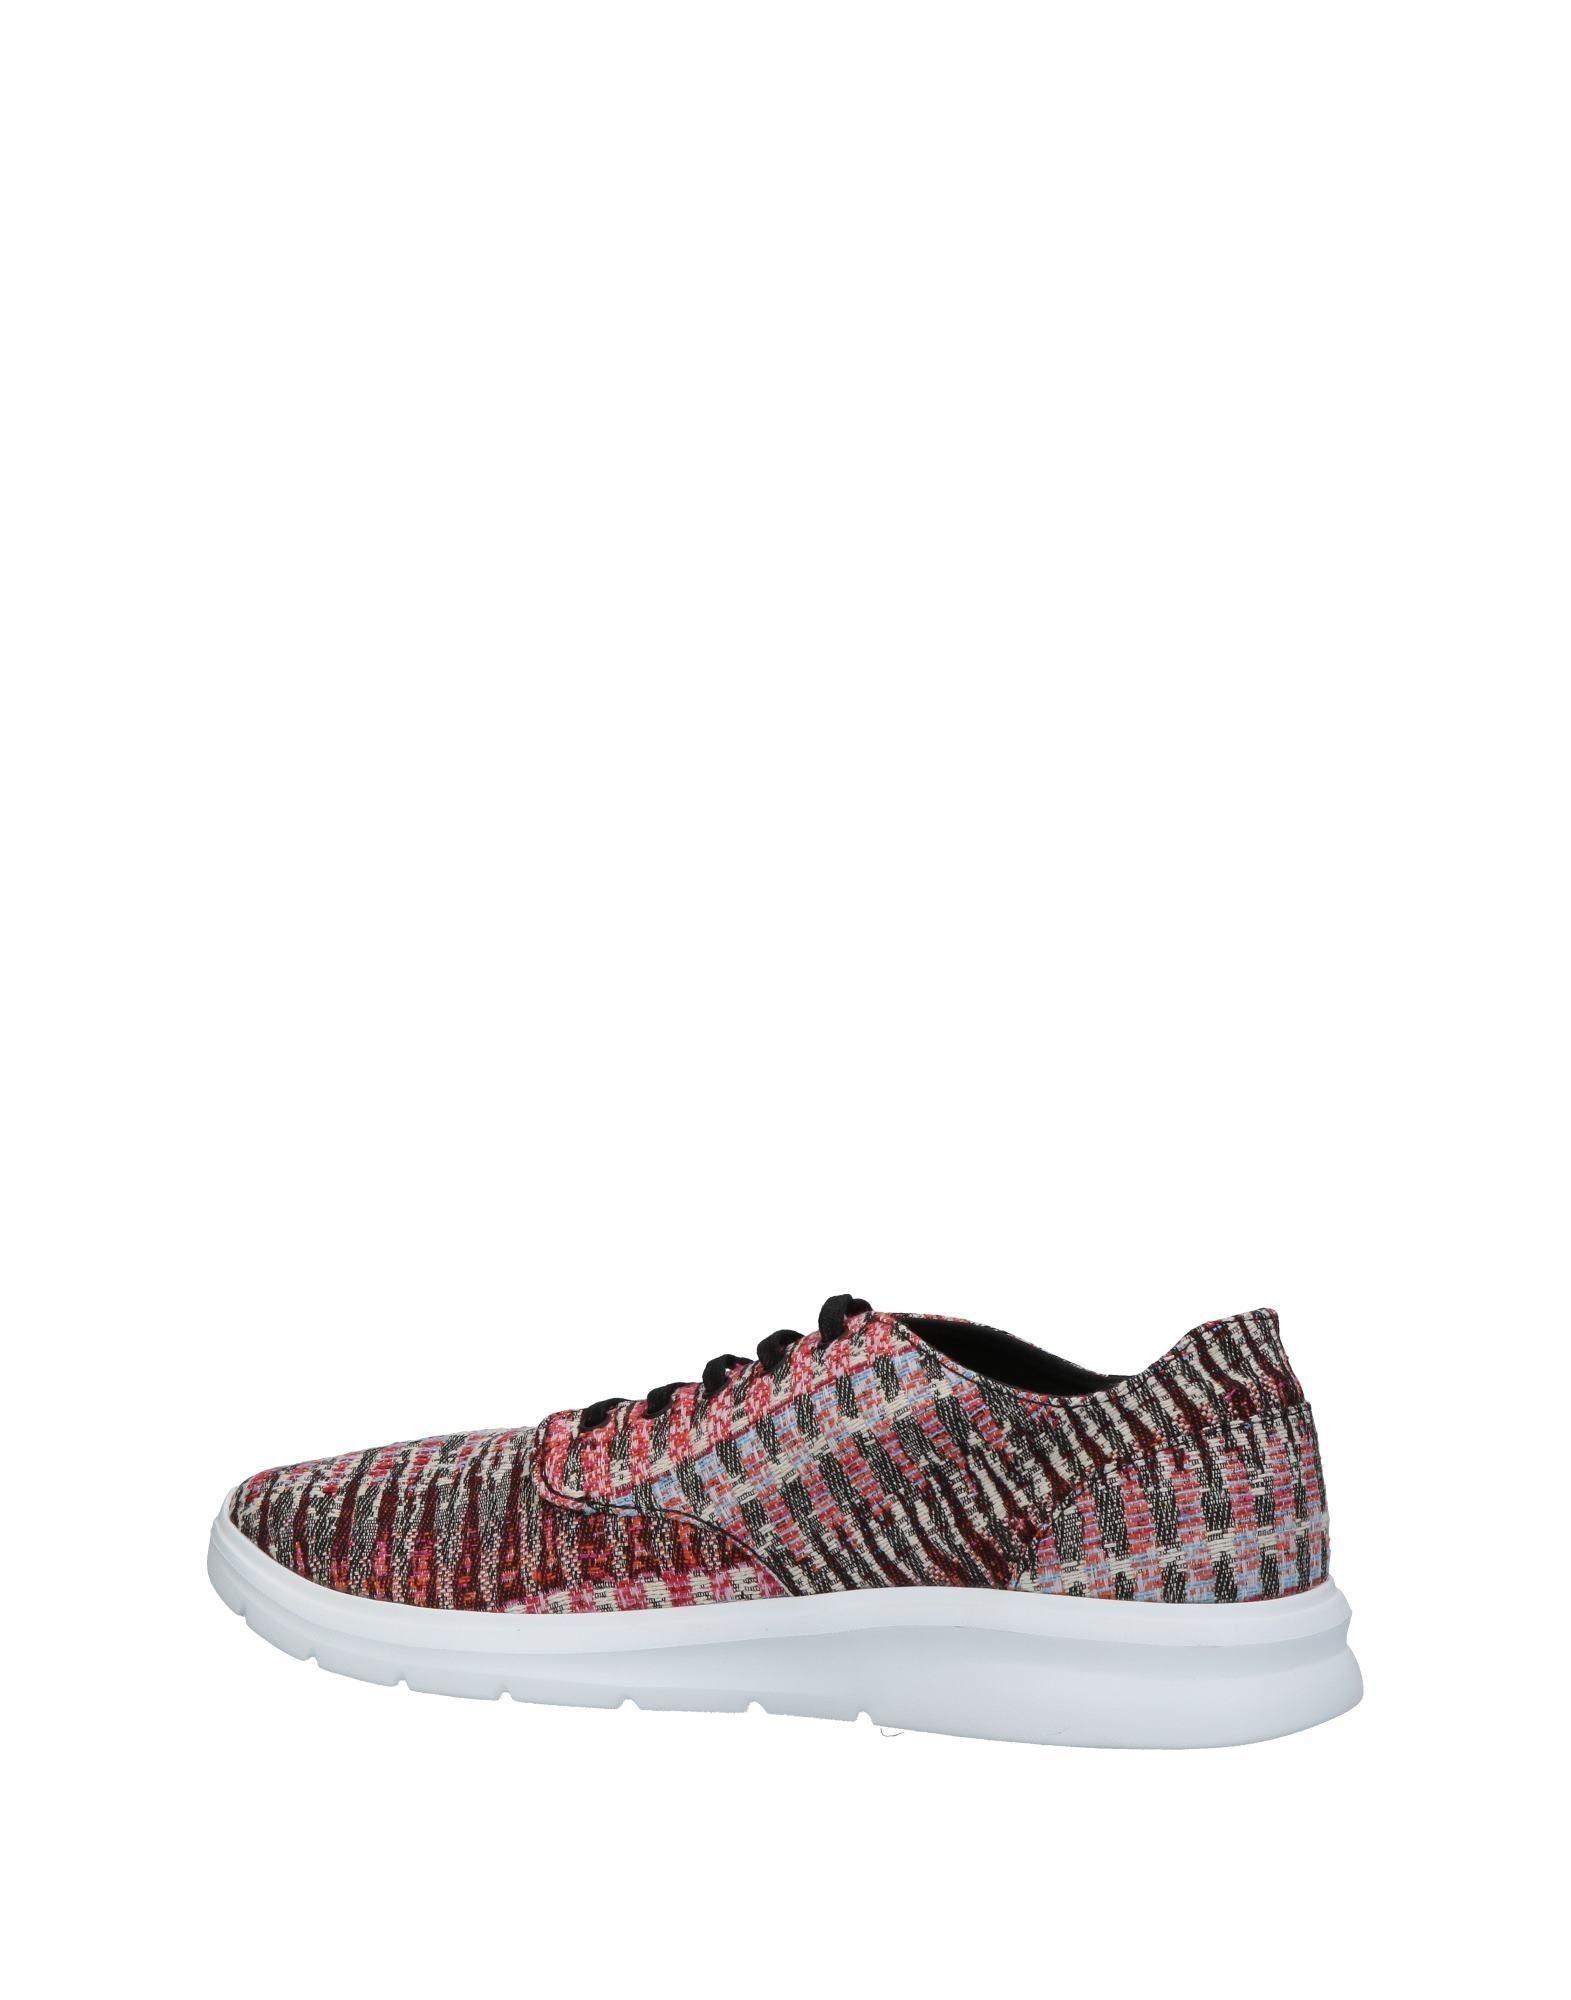 Vans Sneakers Herren  11376469FA Heiße Schuhe Schuhe Heiße 234ac9